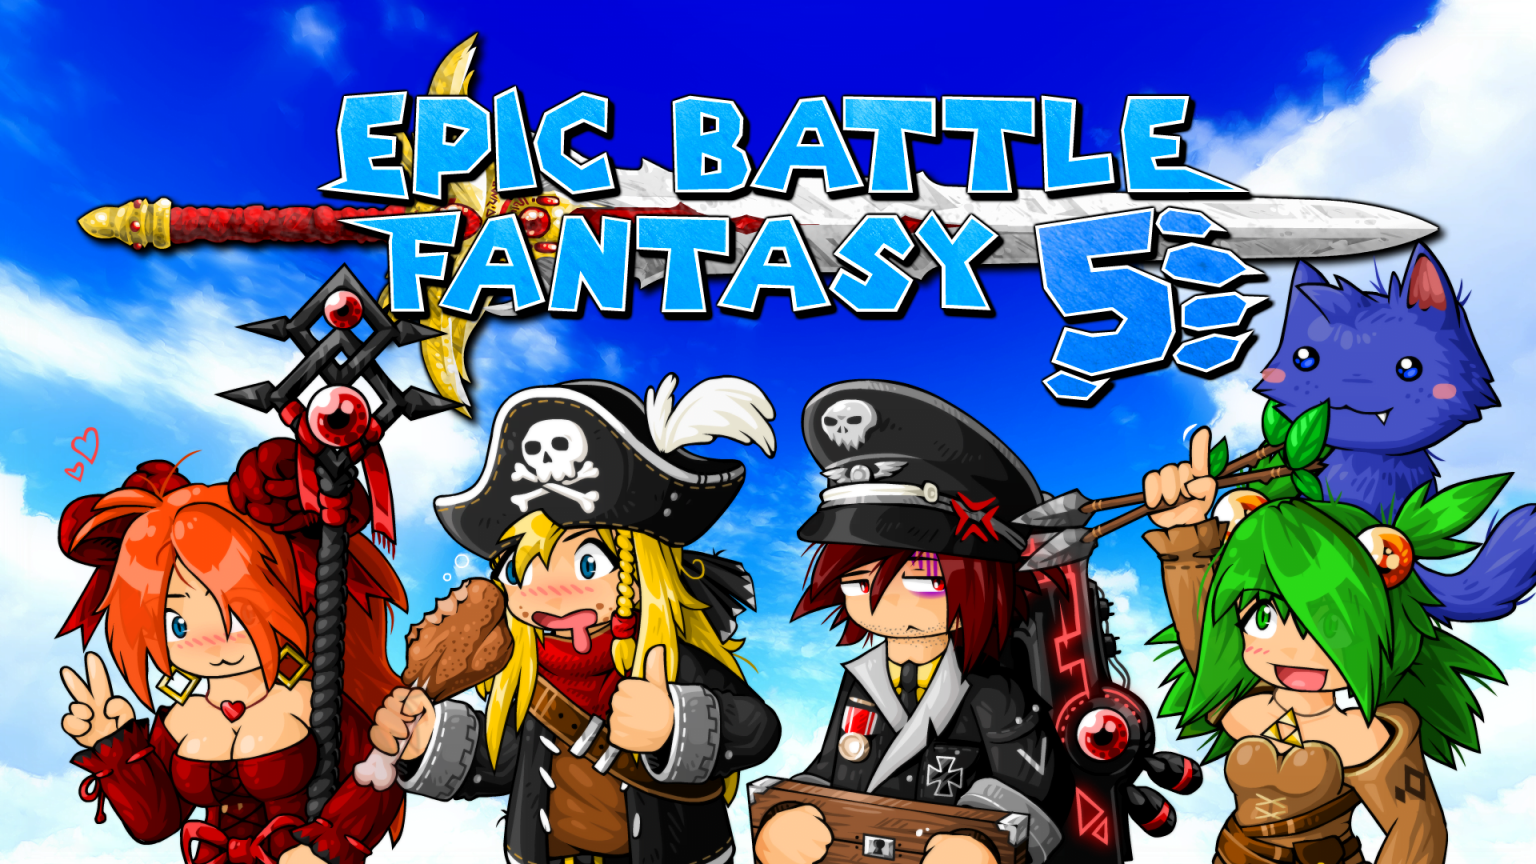 Epic Battle Fantasy 5 Full Version Free Download